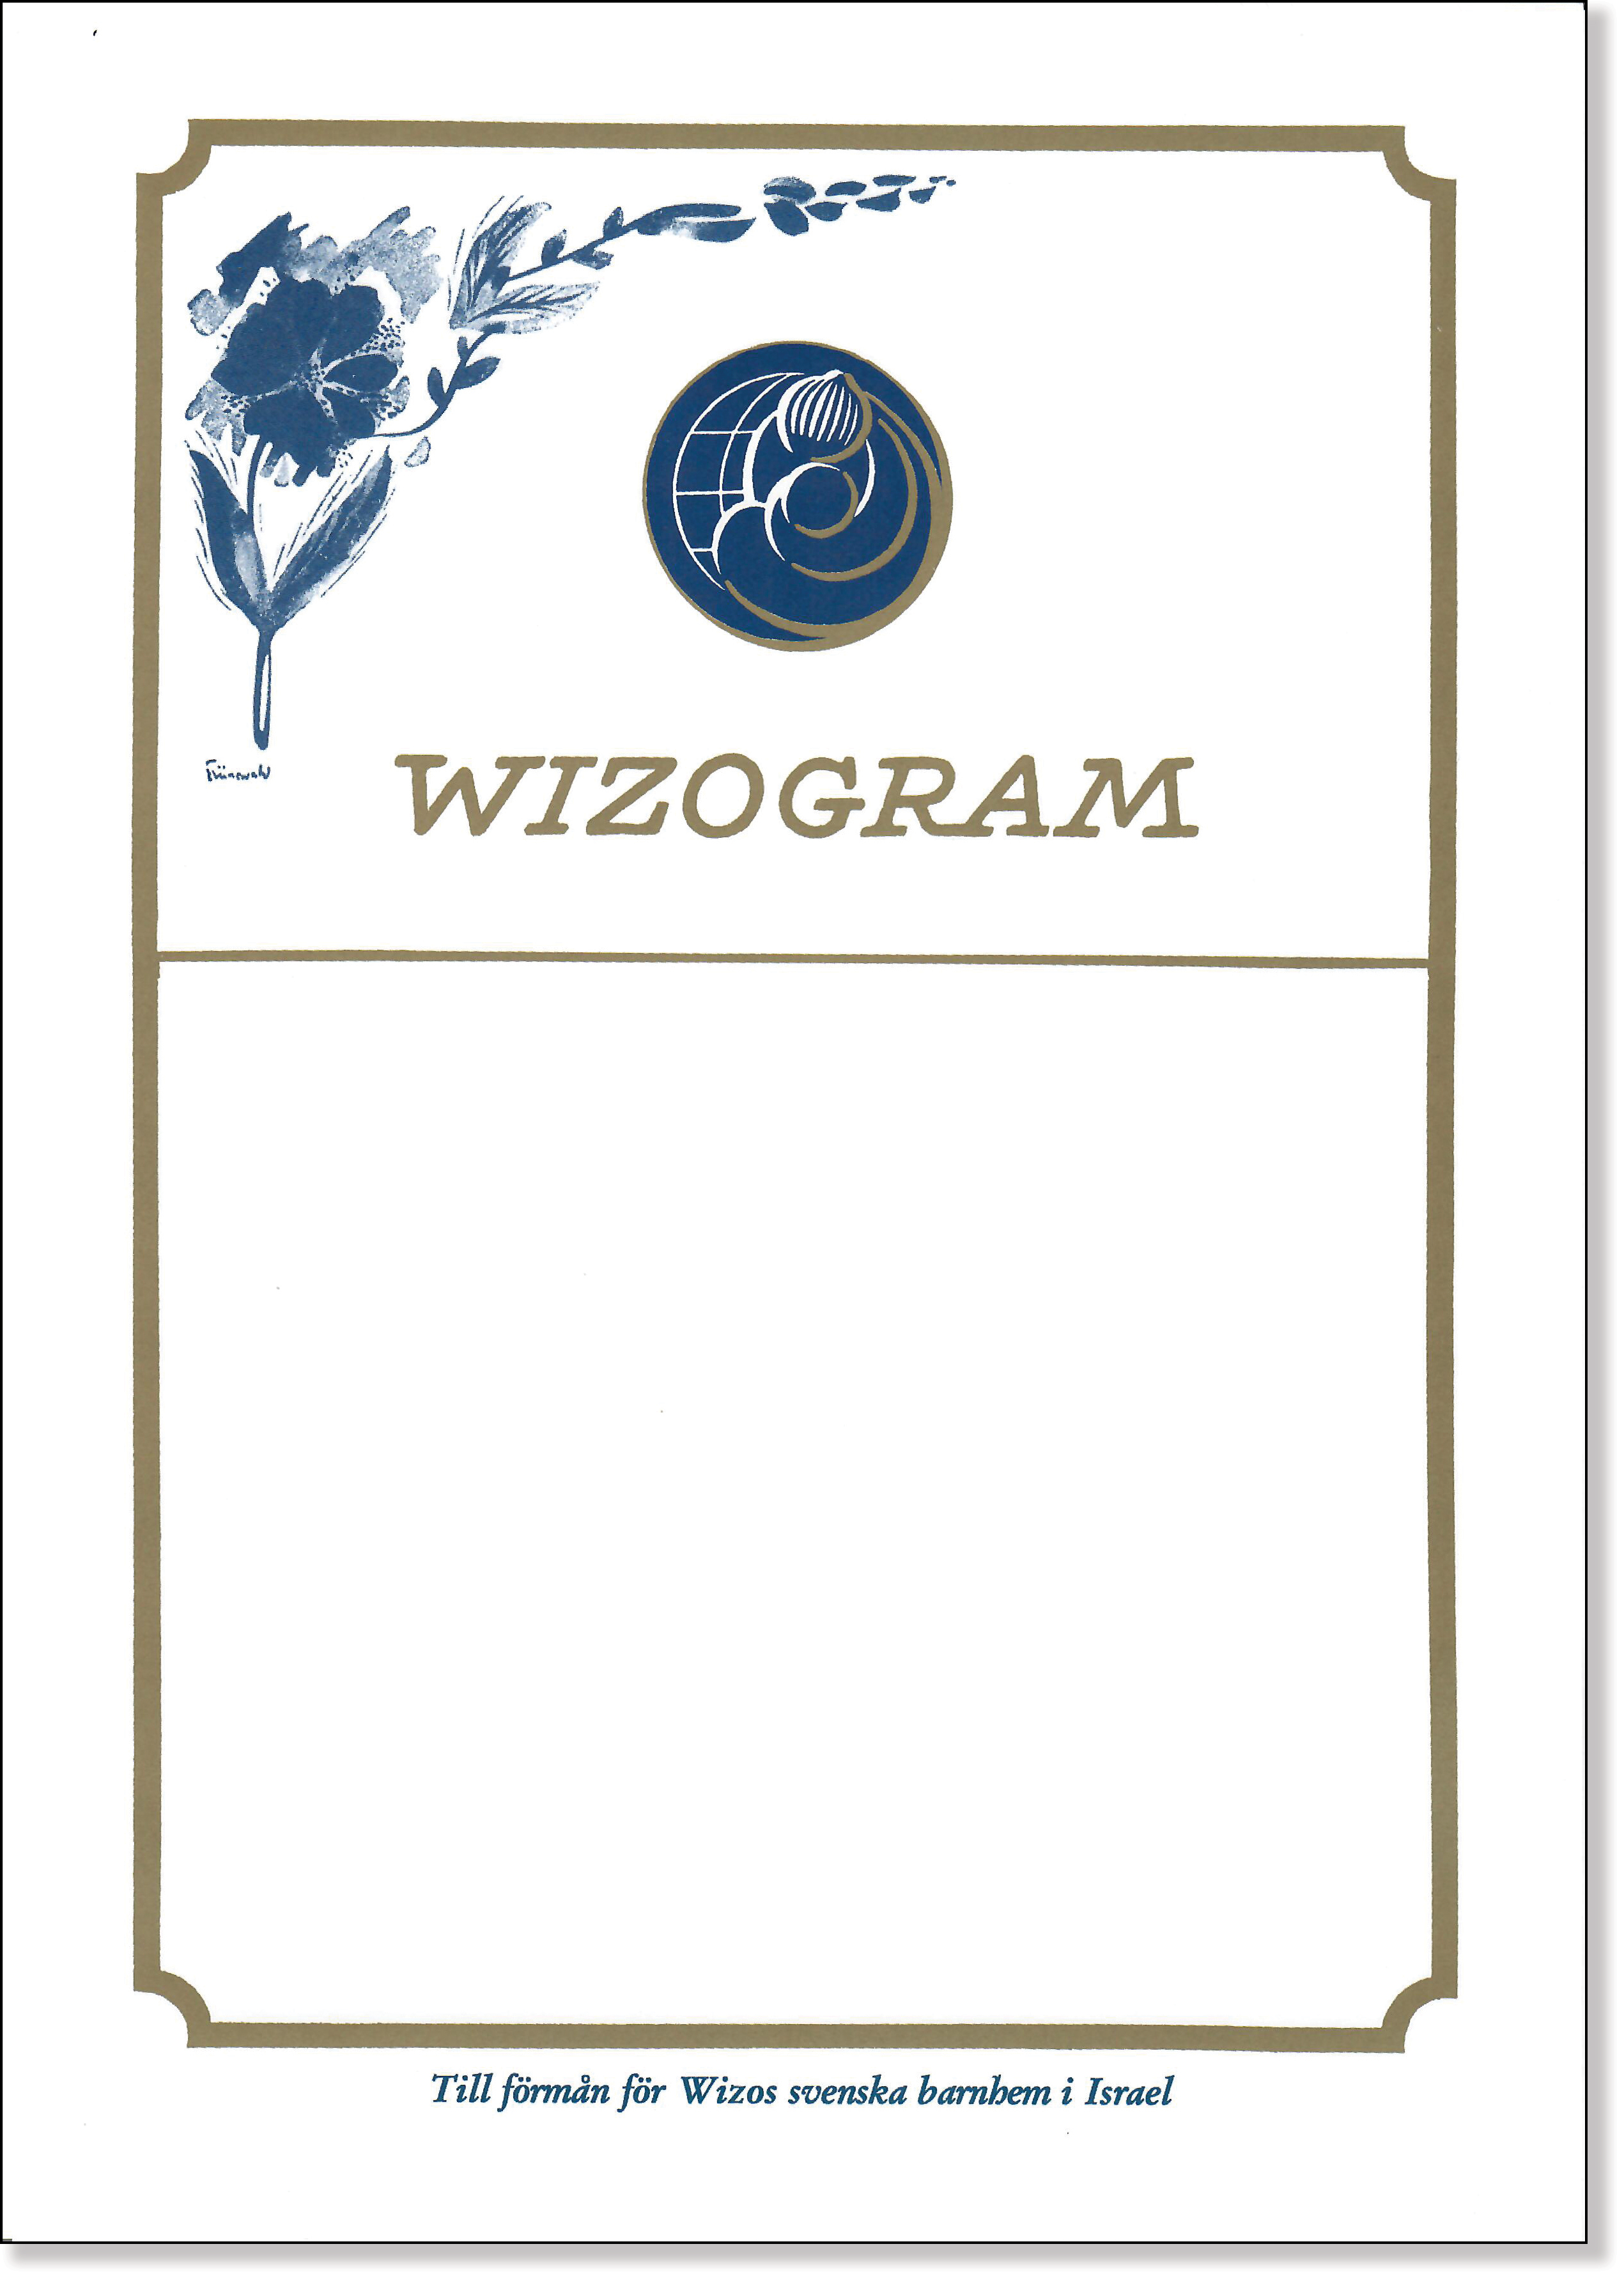 Wizogram